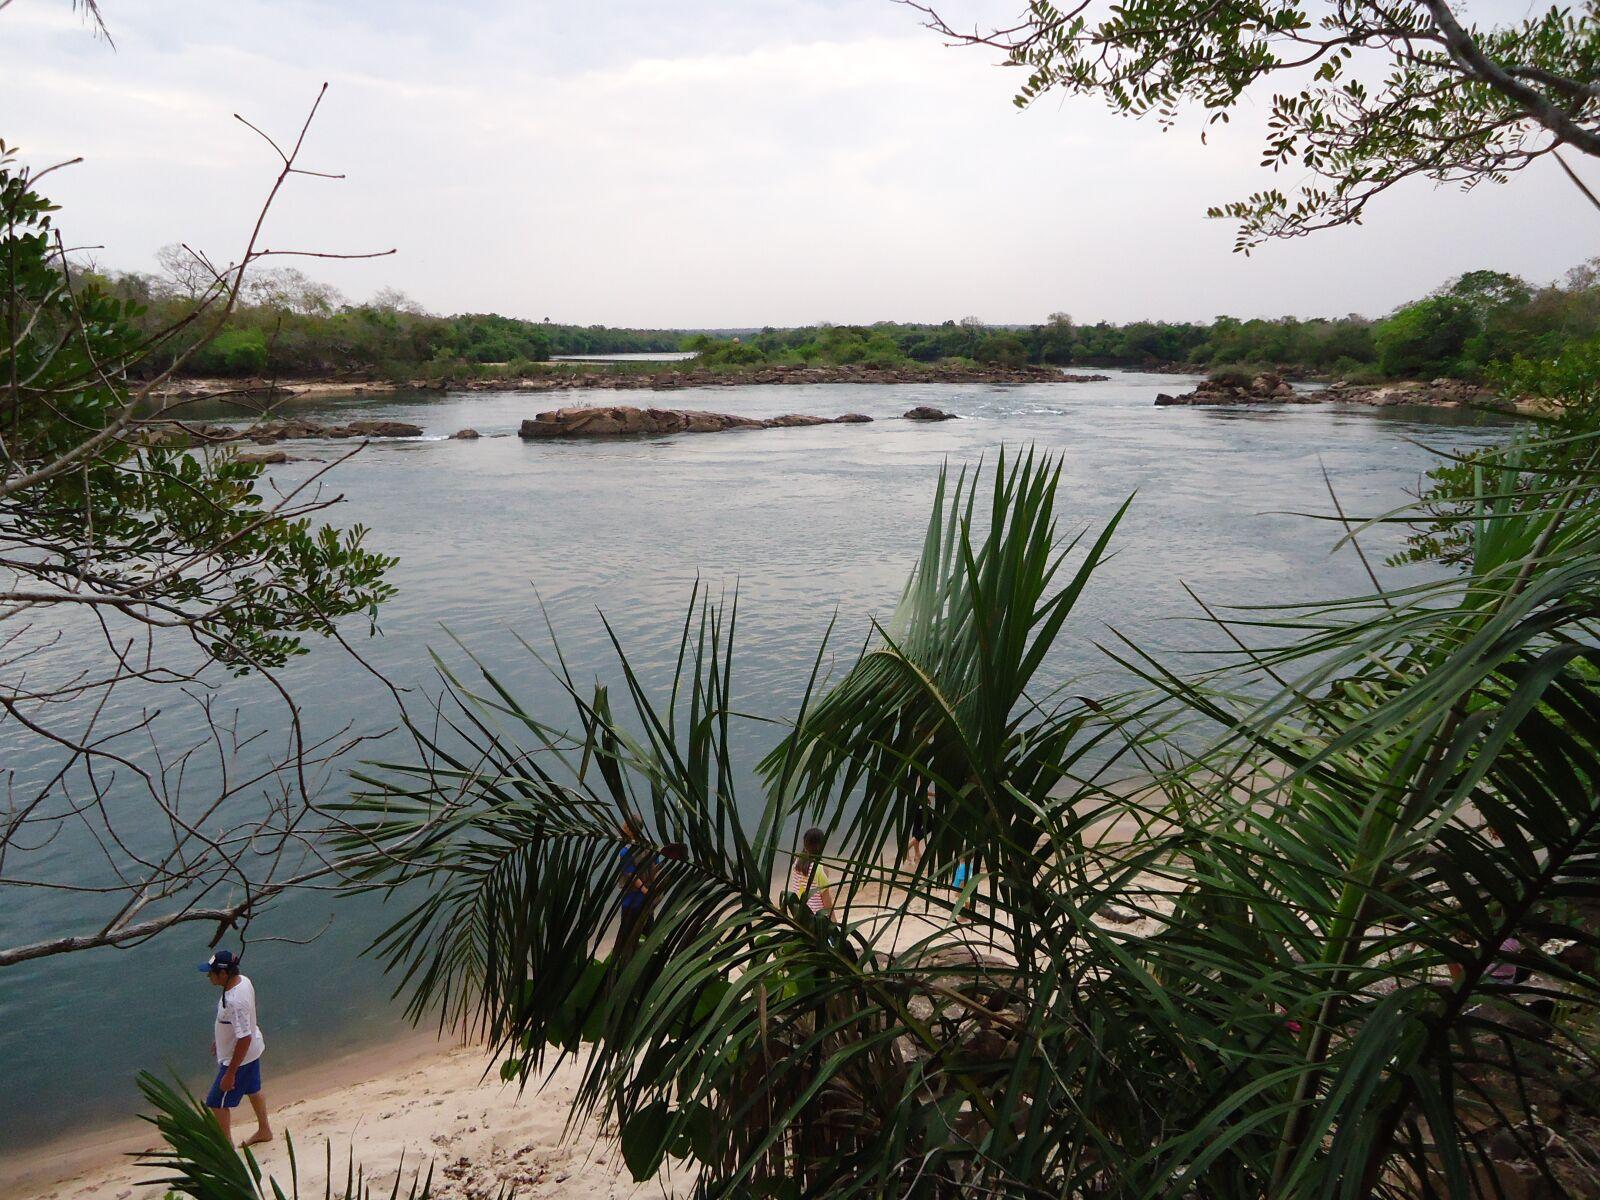 river, nature, tourism